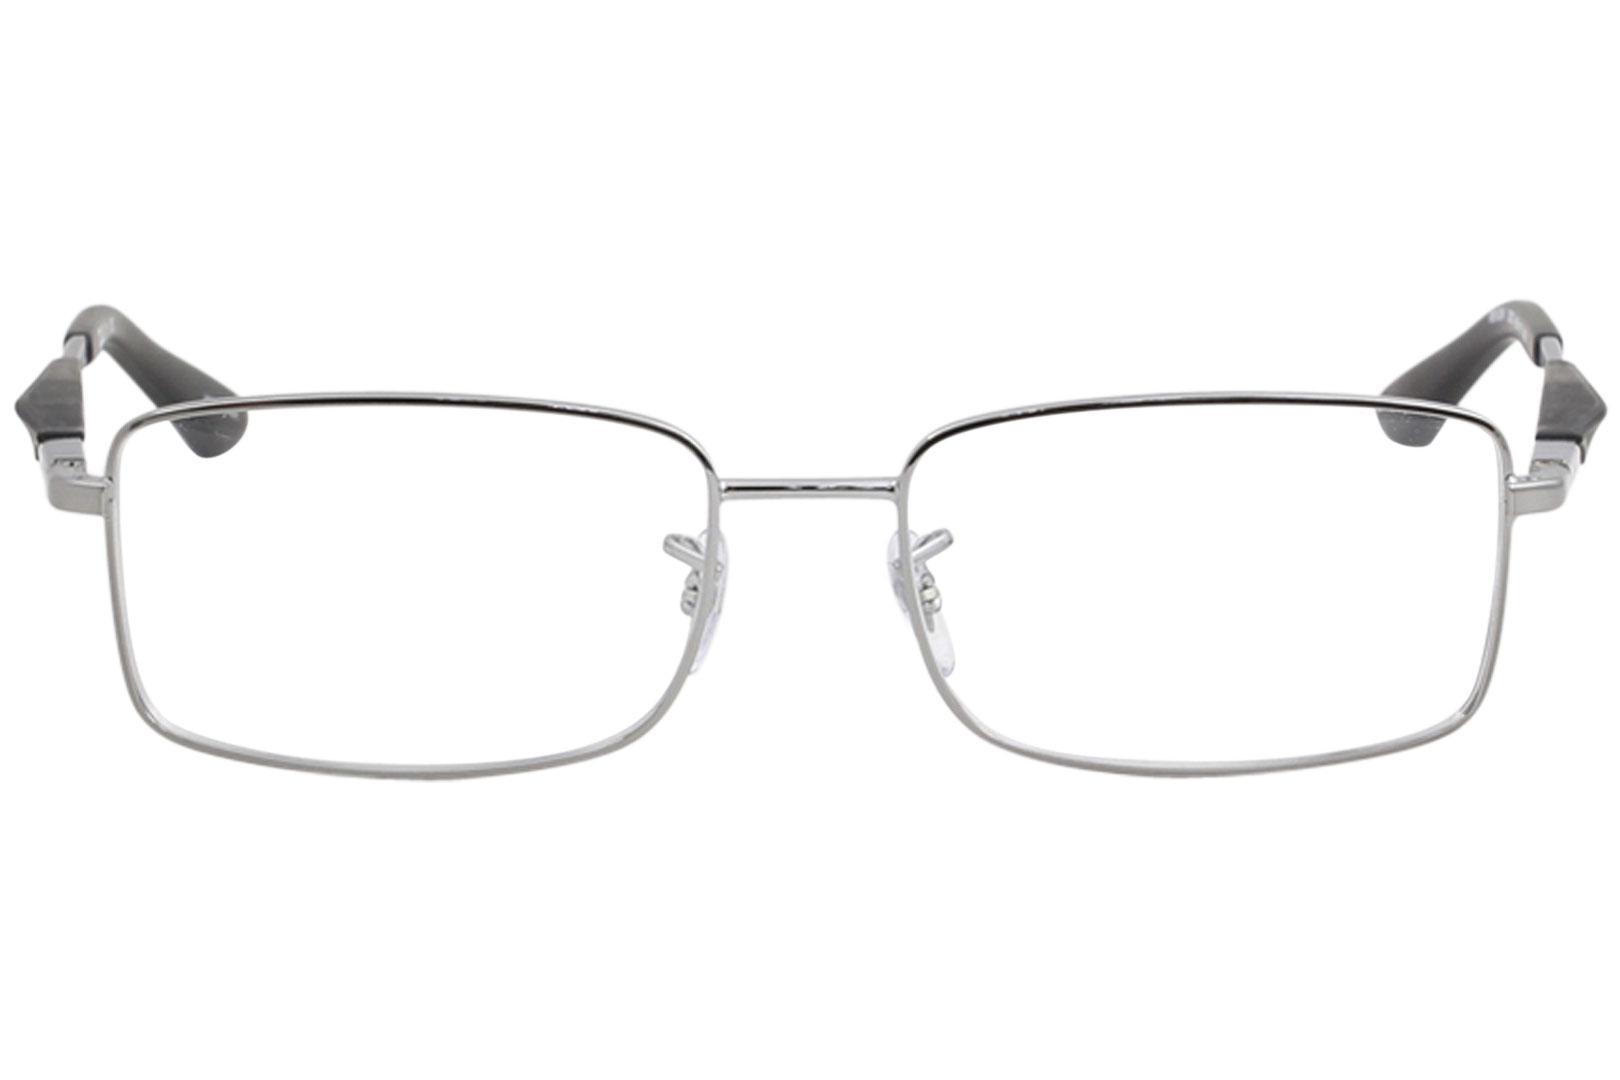 eb584429c6c1 Ray Ban Men s Eyeglasses RX6284 RB 6284 RayBan Full Rim Optical Frame by Ray  Ban. 12345